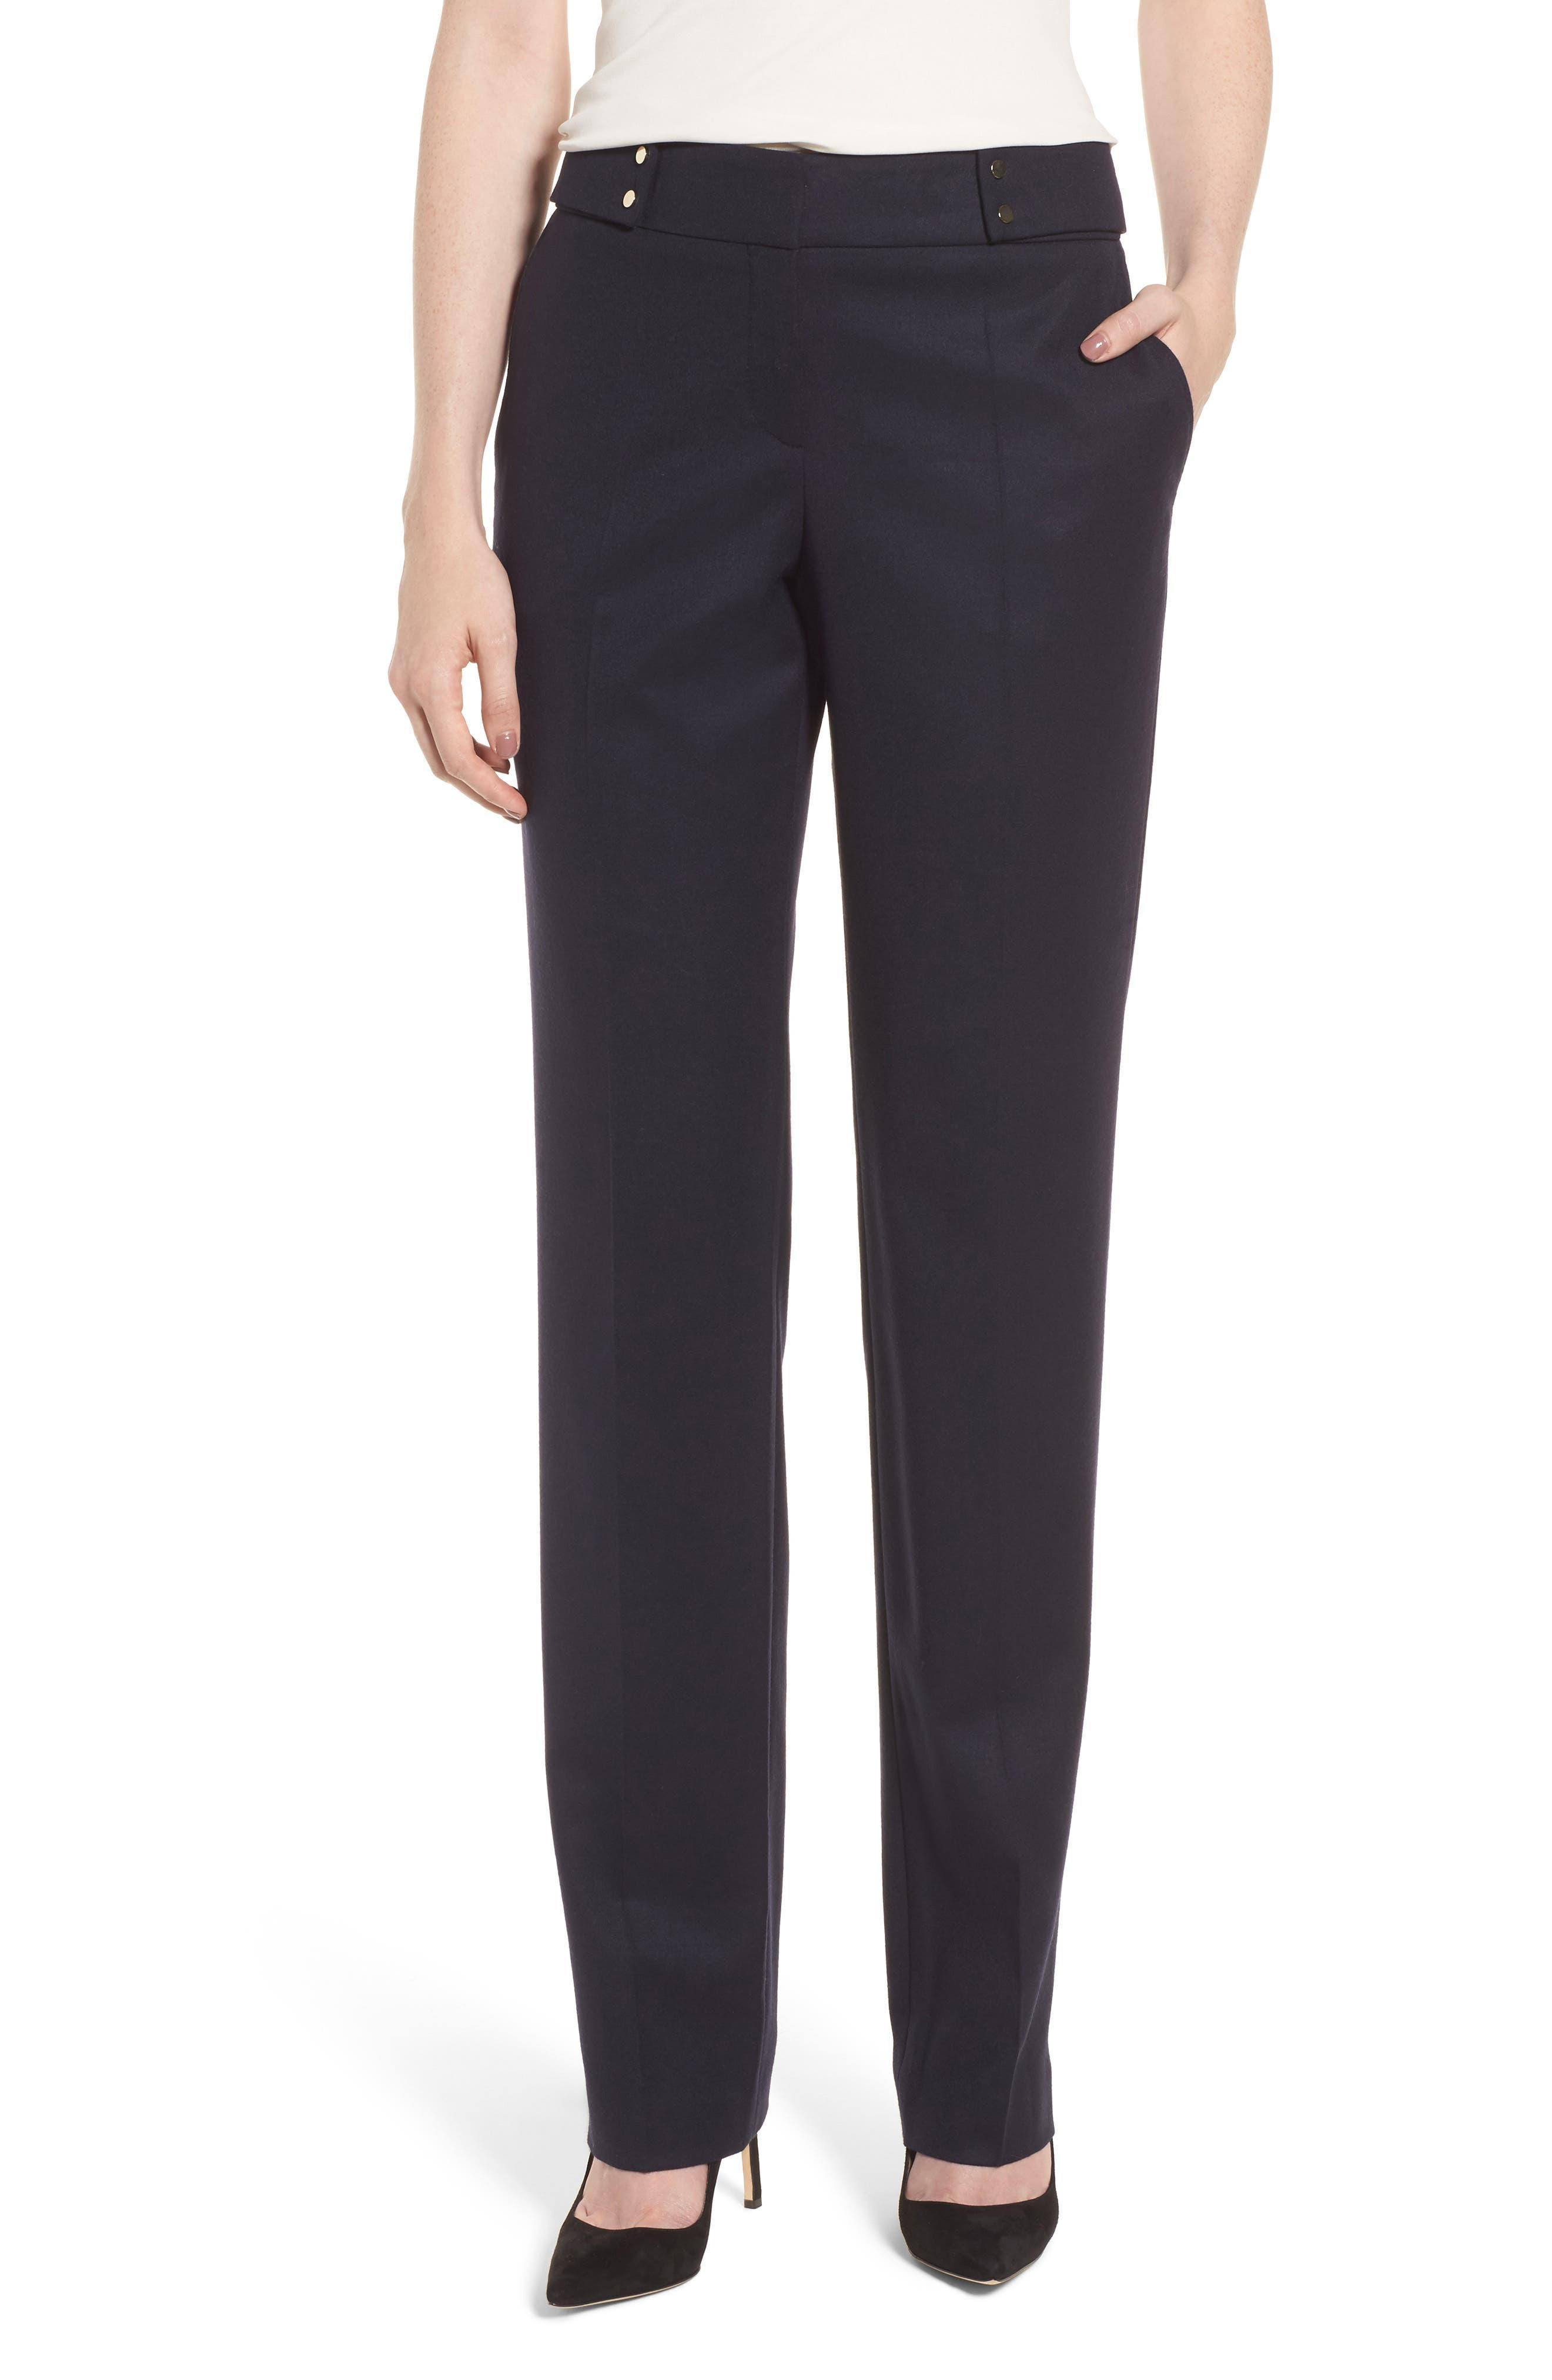 Tamea Pants,                         Main,                         color, 480